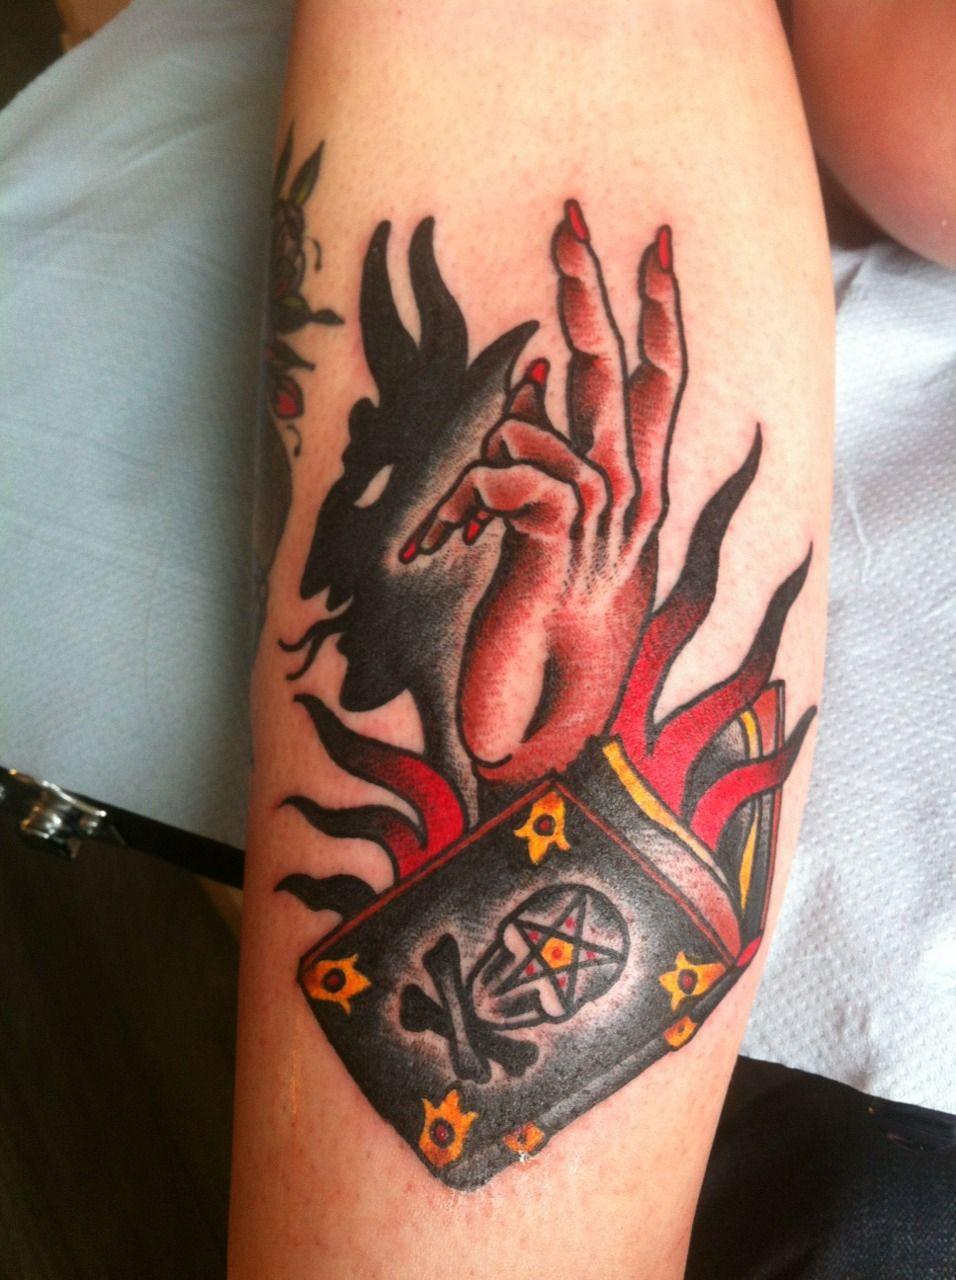 Satanic coloured old school tattoo hand tattoos pinterest hand shadow satan tattoo design with pagan symbol tattoo biocorpaavc Gallery